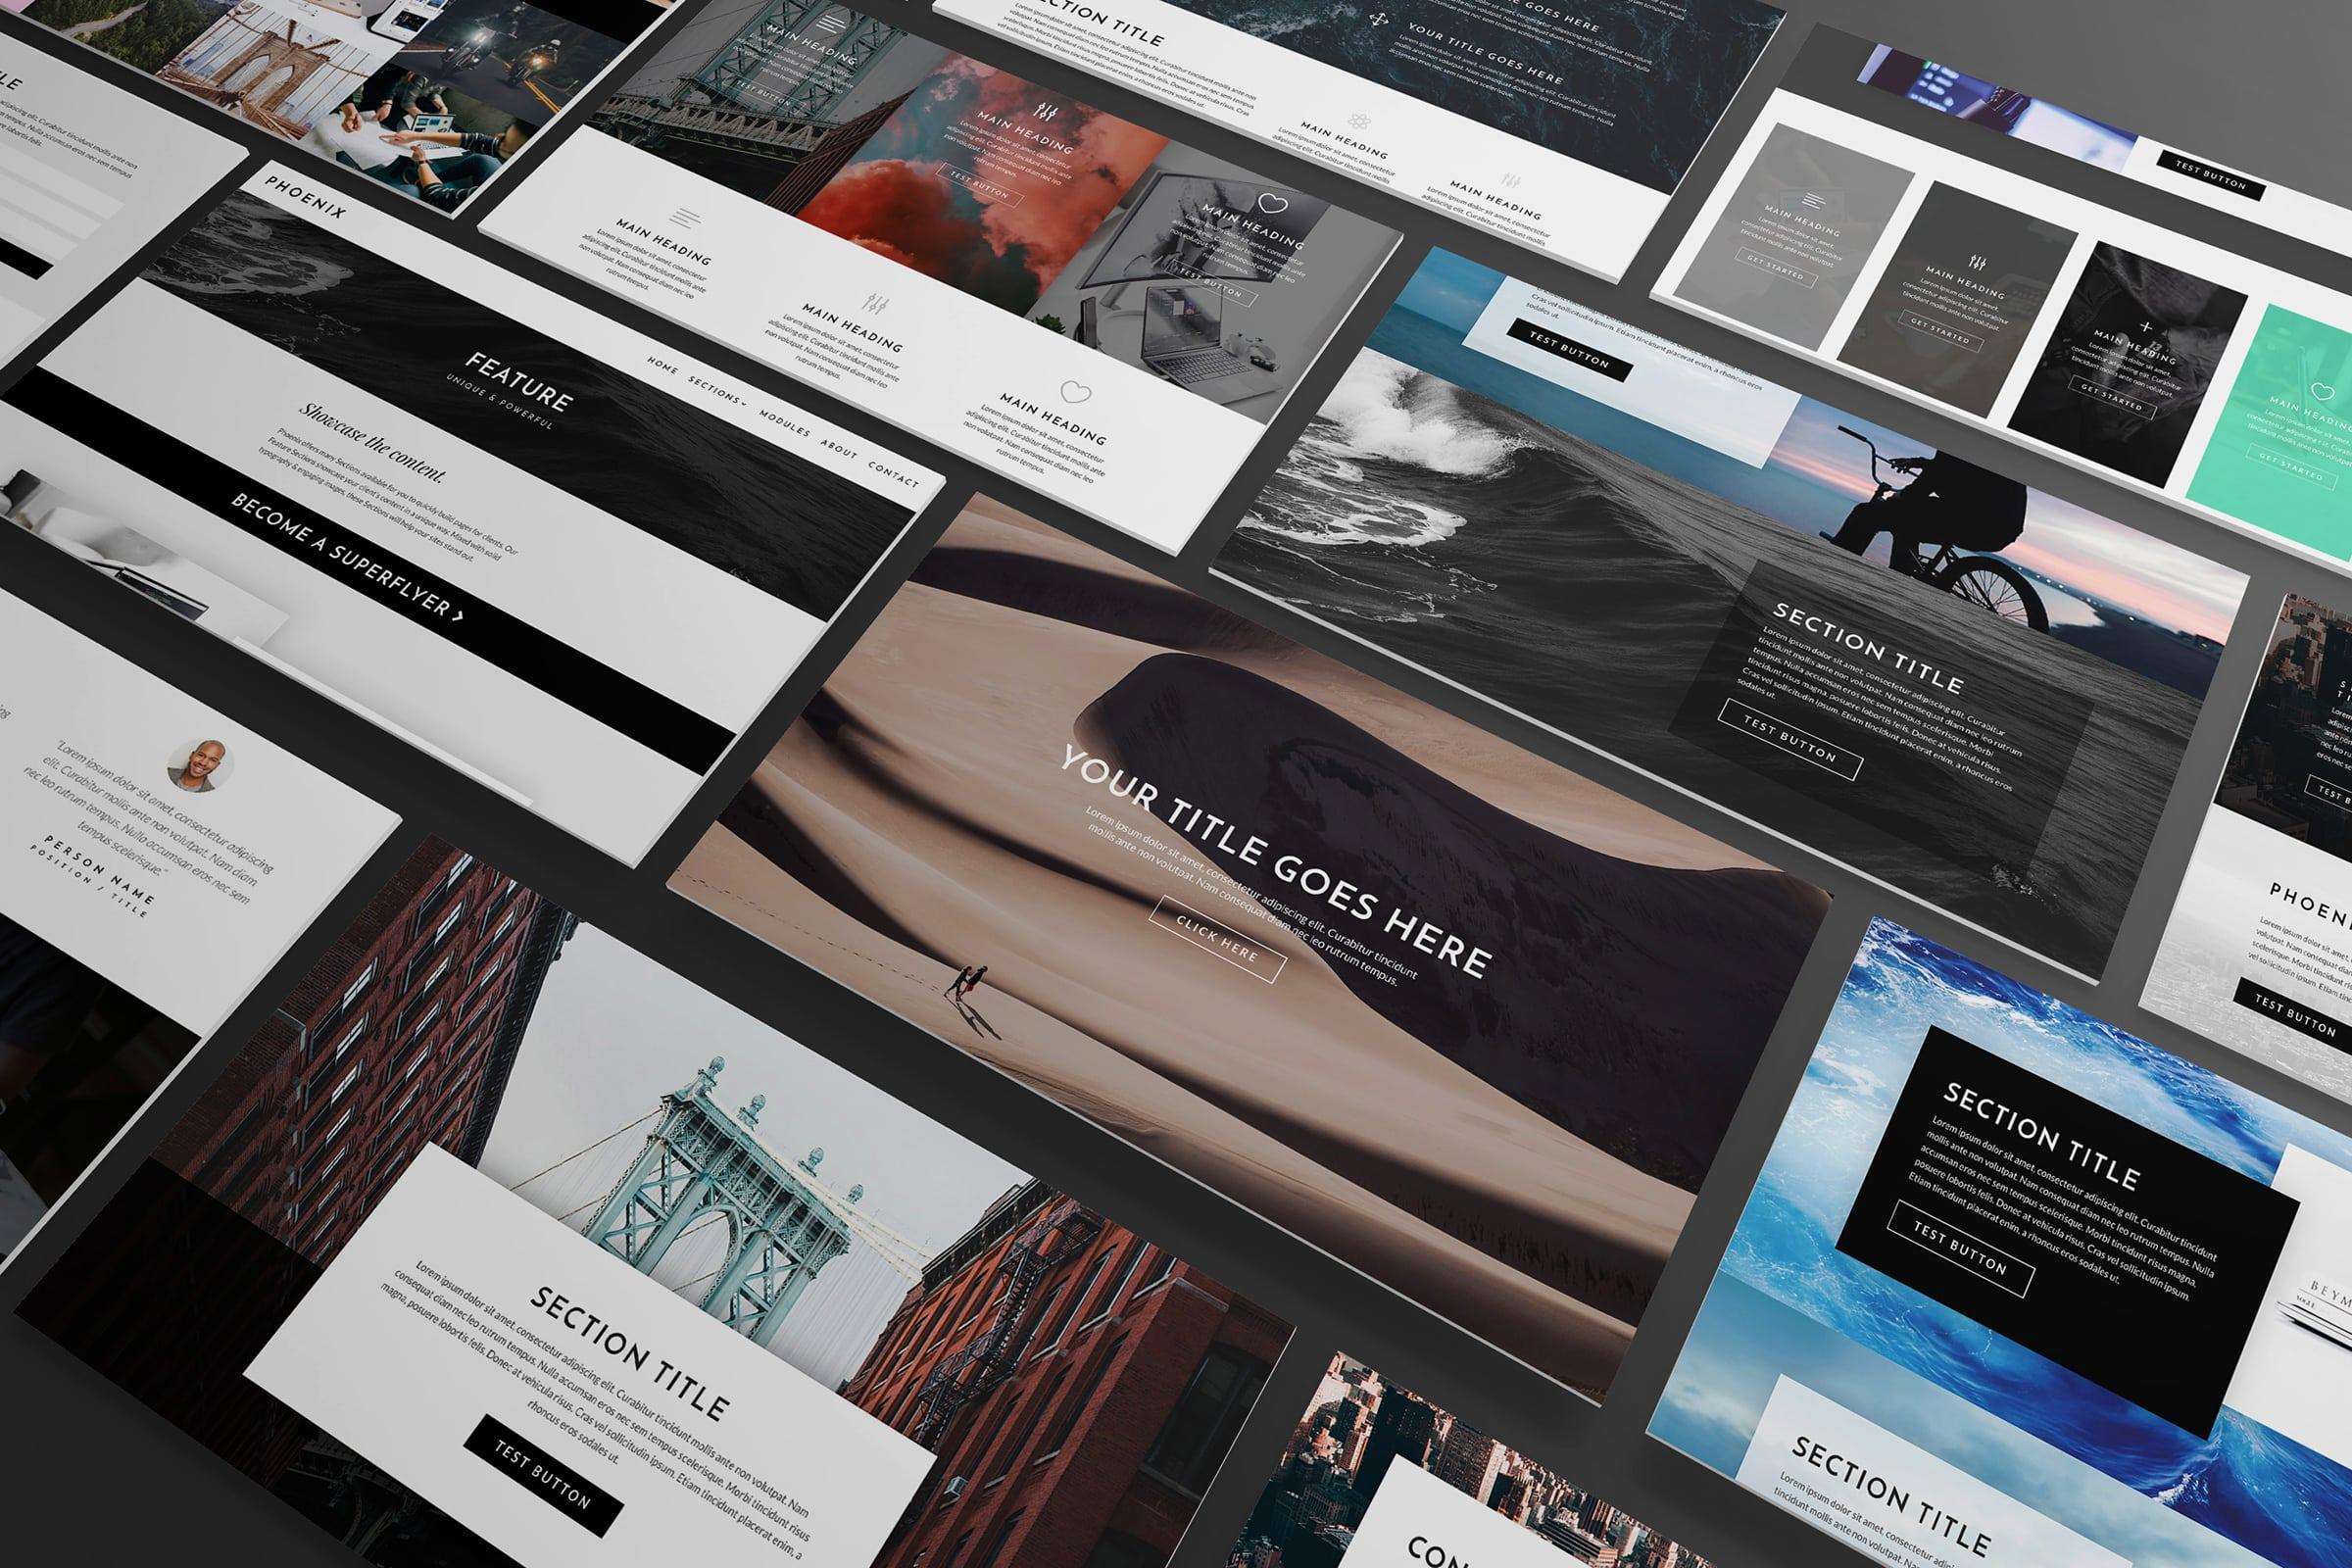 Gifted Owl portfolio - Images of website screens showcasing designs